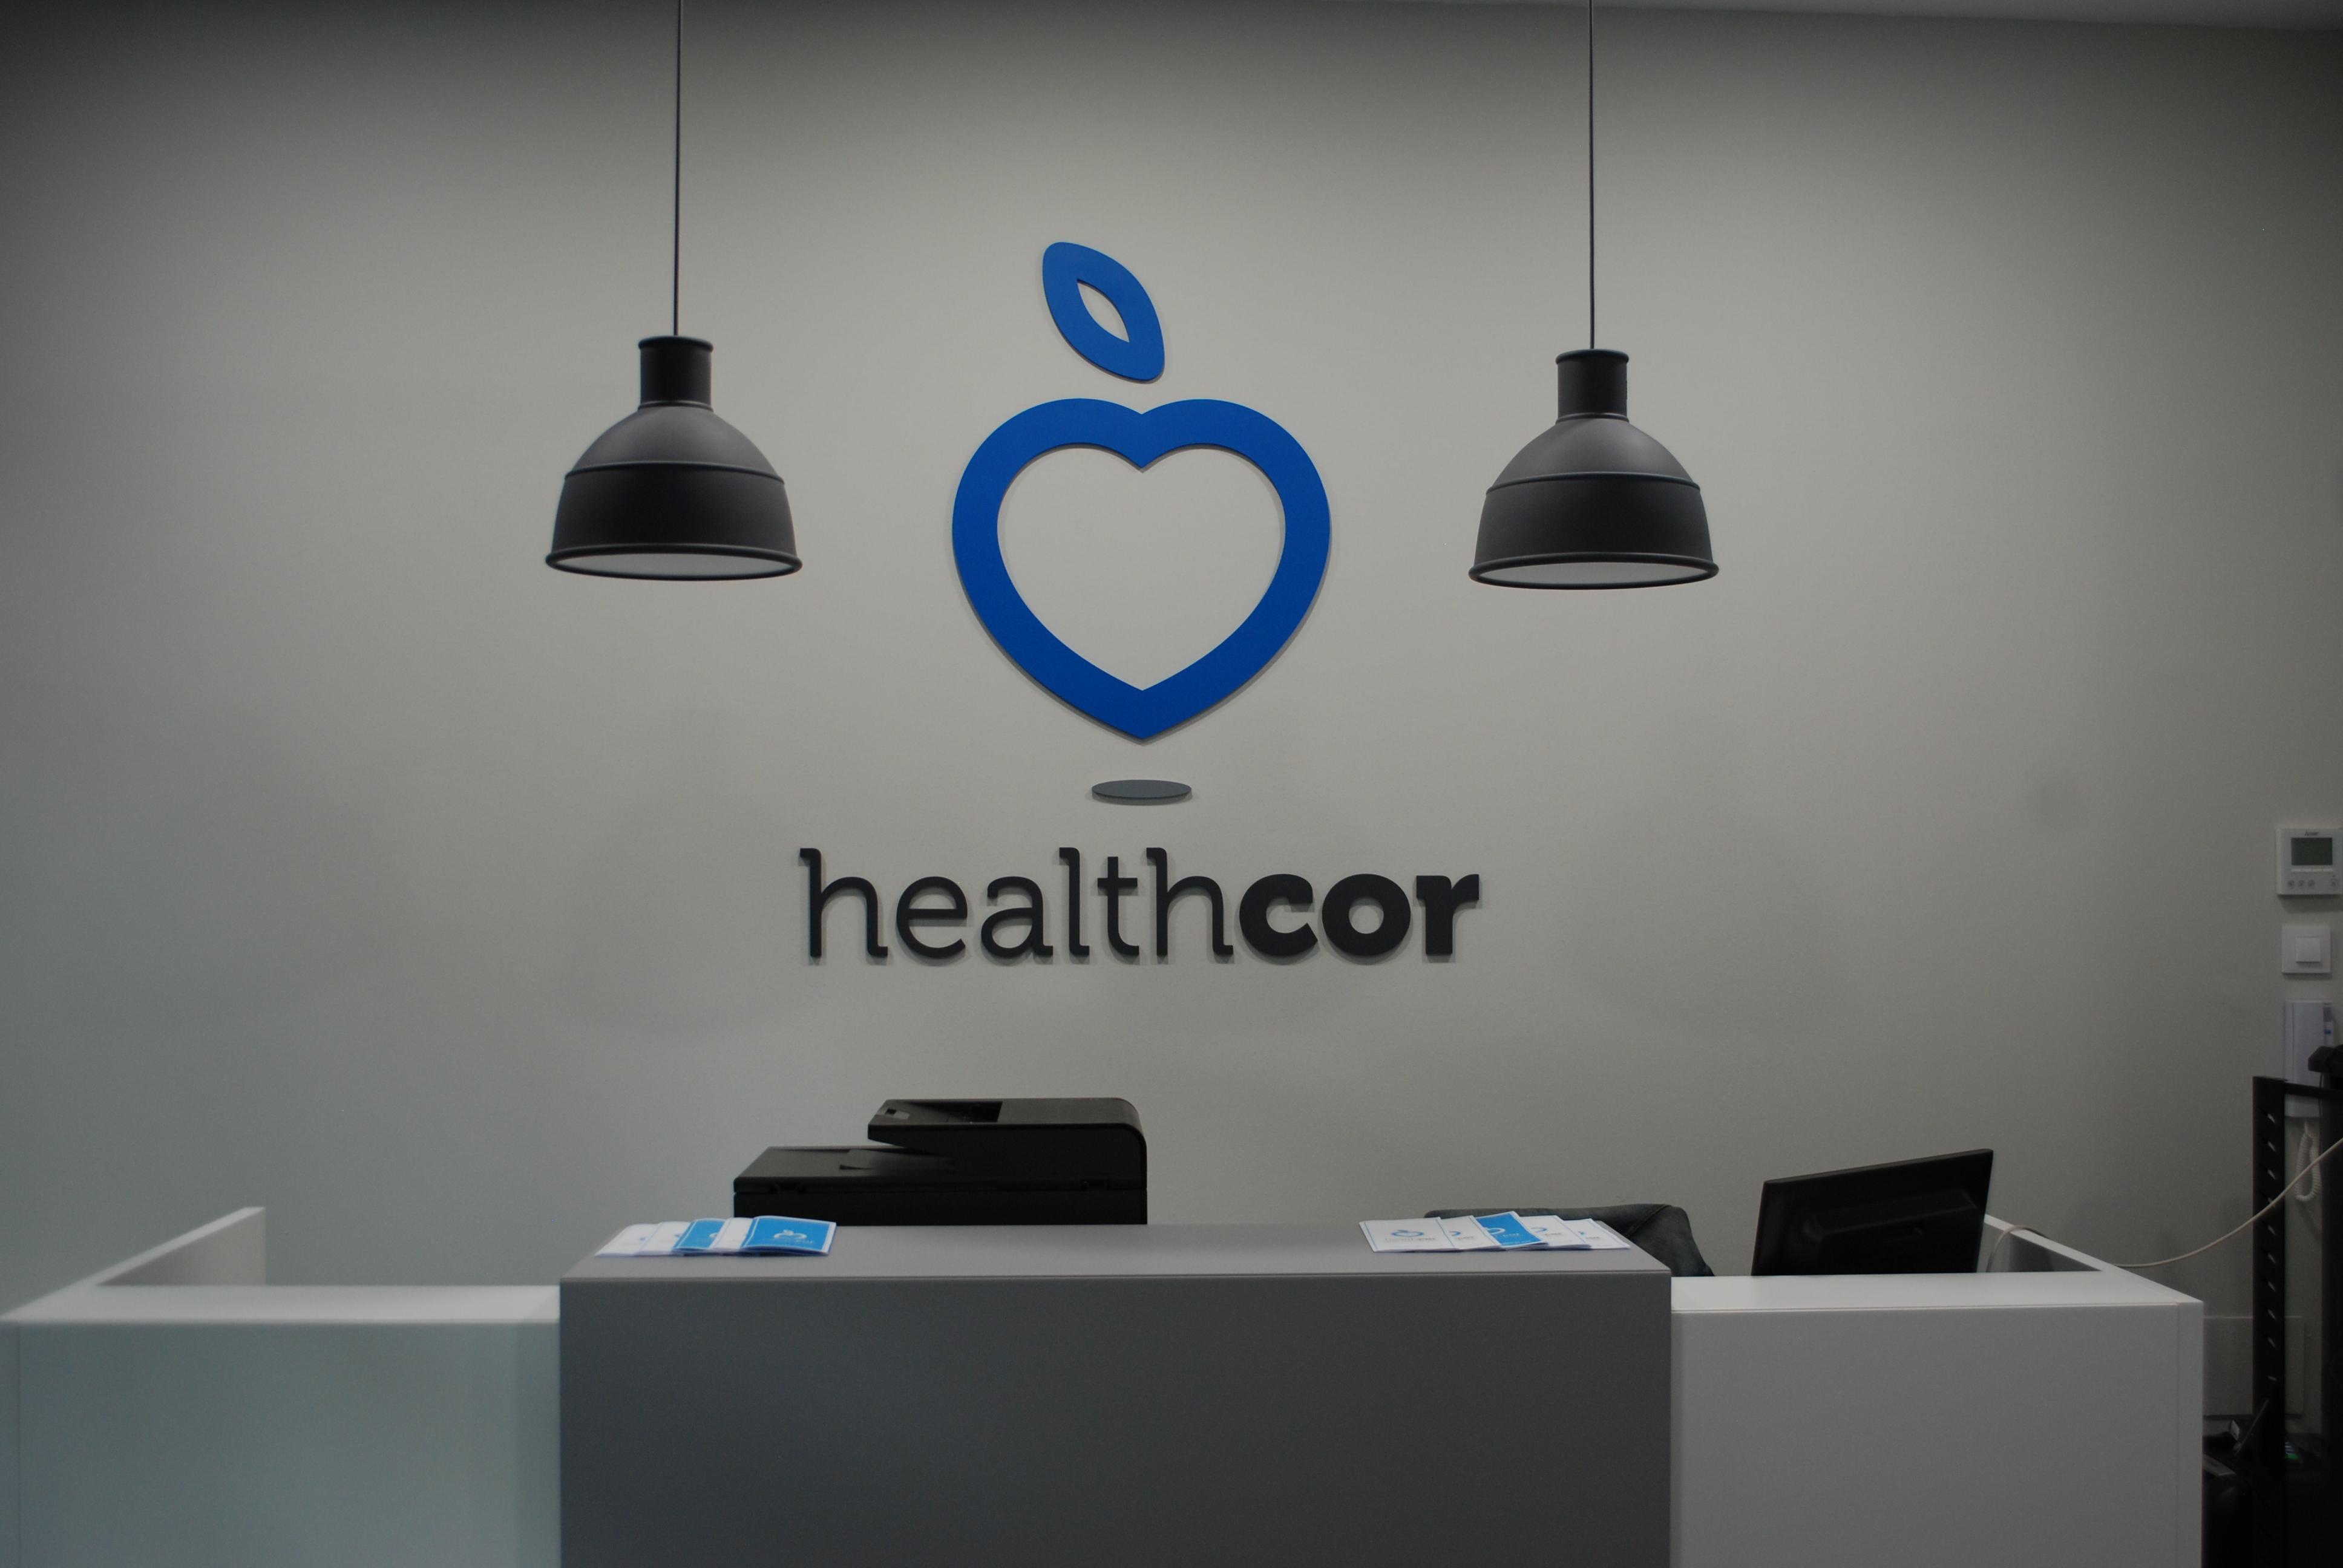 Healthcor